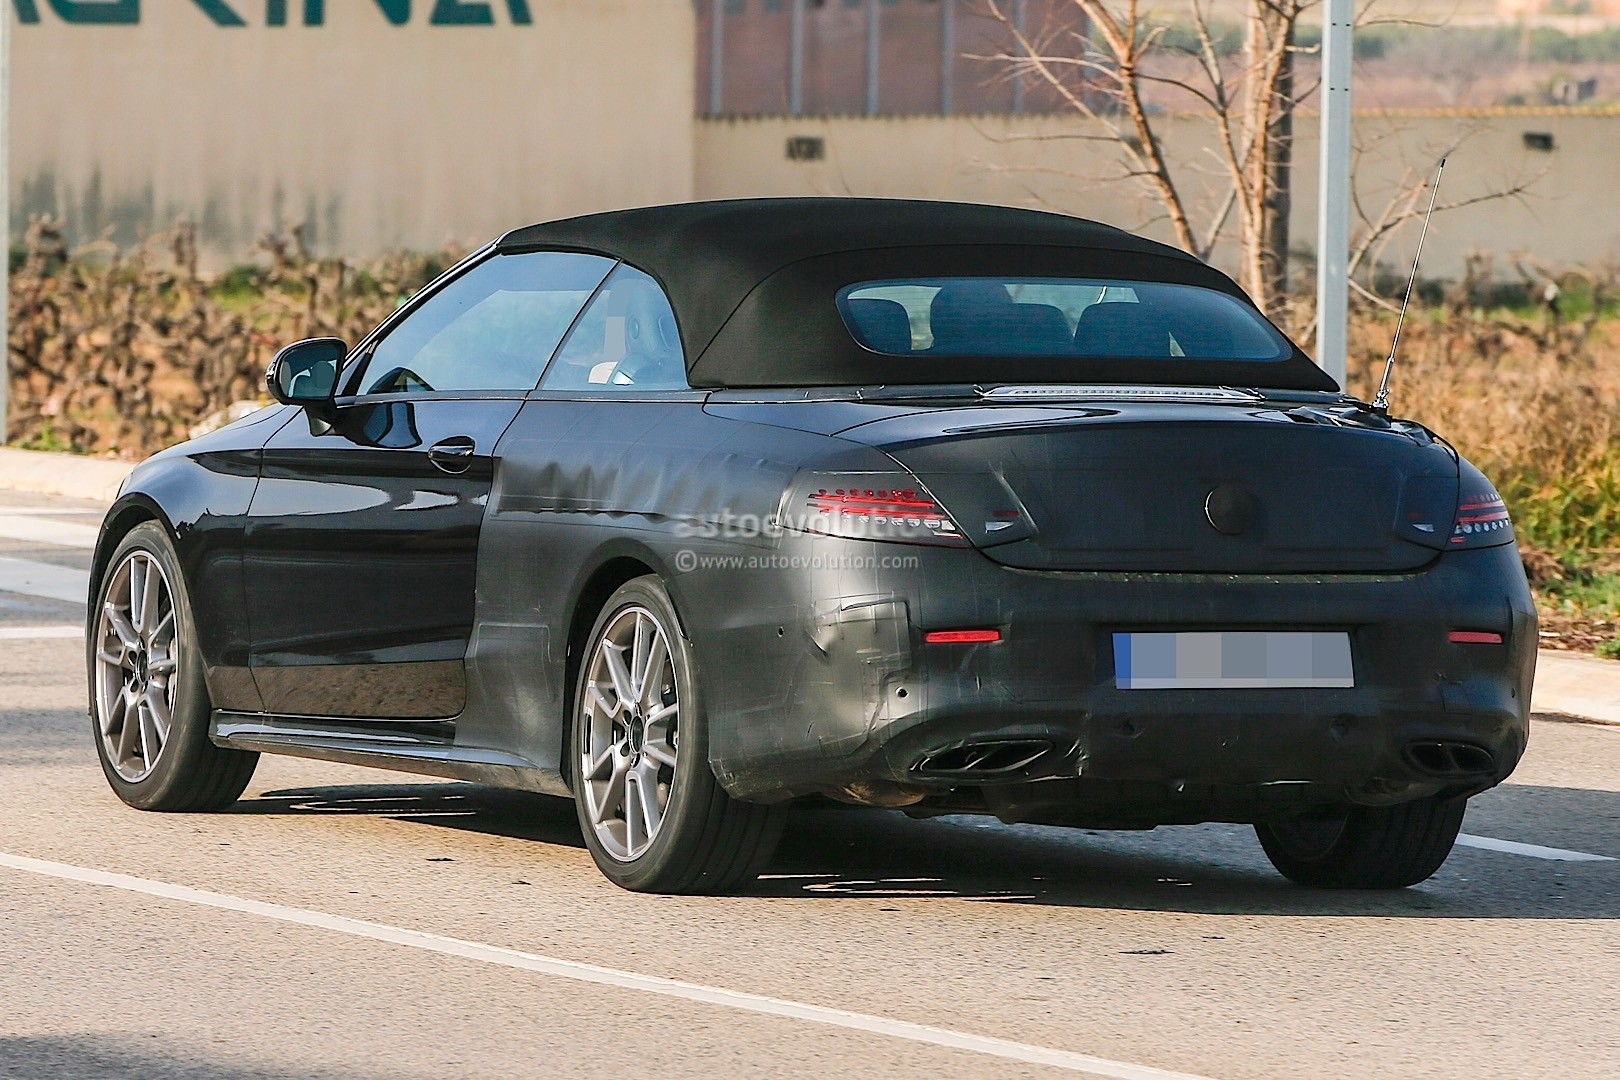 https://s1.cdn.autoevolution.com/images/news/gallery/2017-mercedes-amg-c43-cabriolet-a205-spied_10.jpg